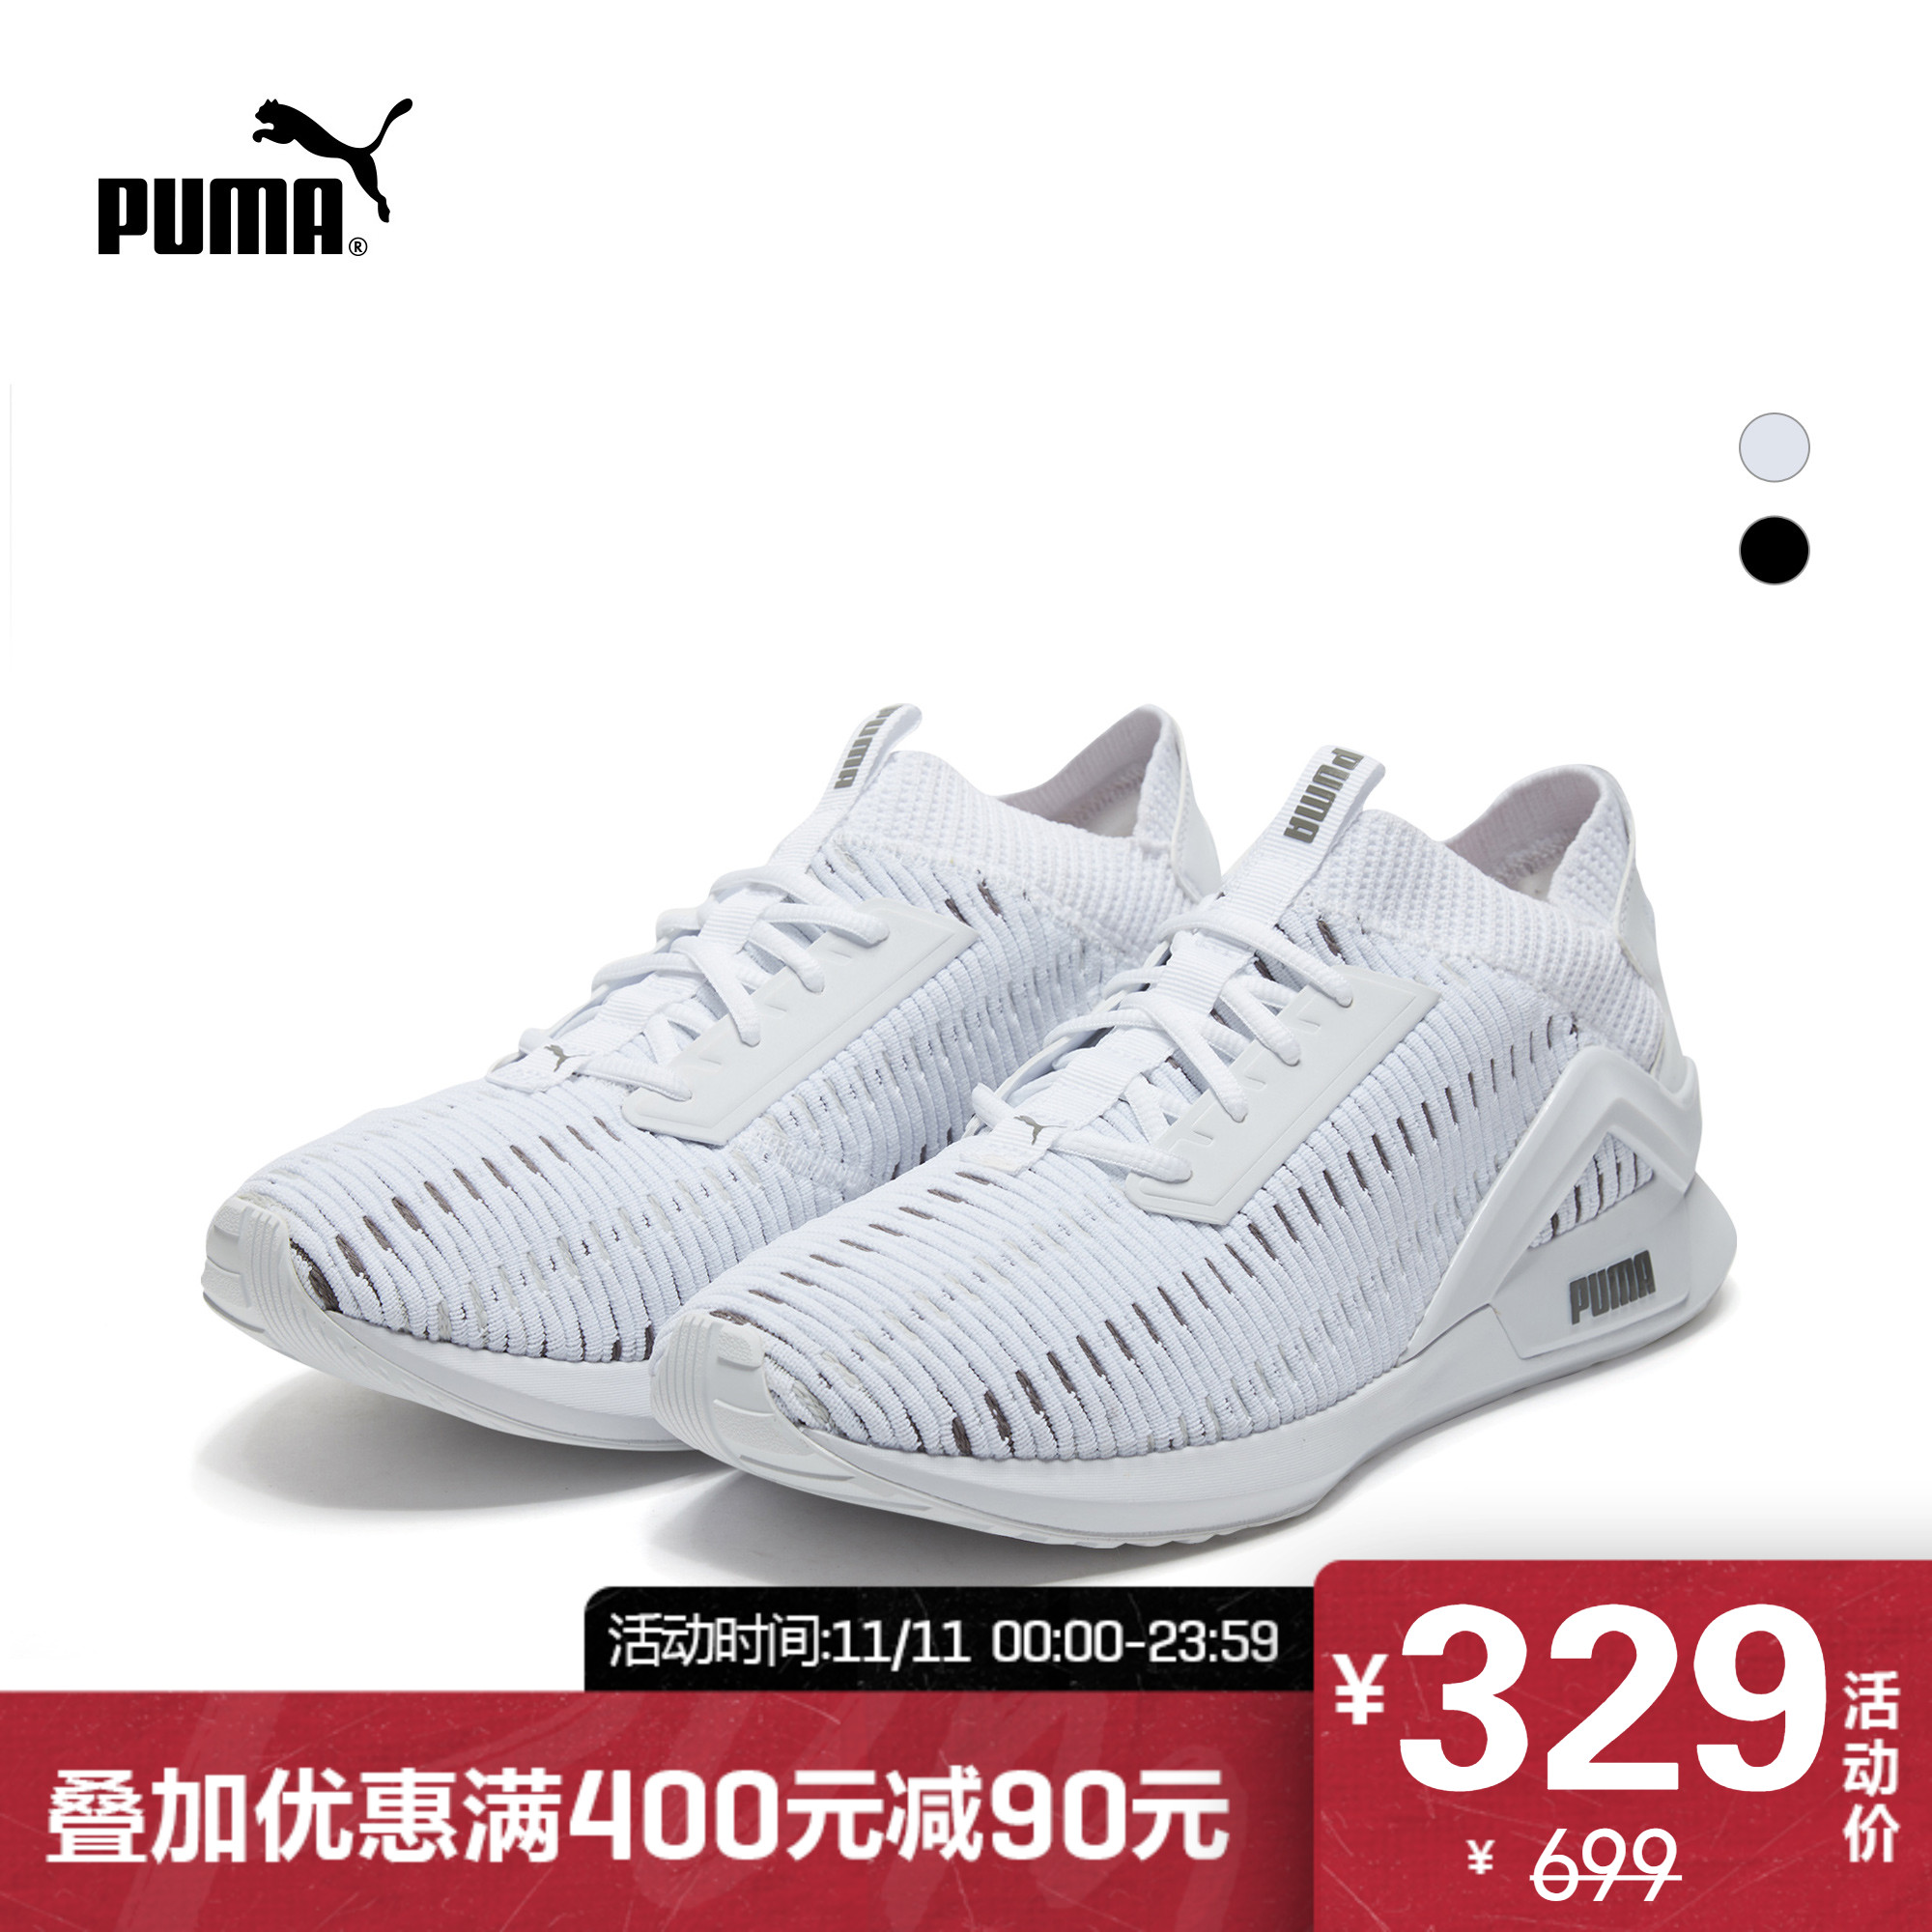 PUMA彪马官方正品  男子缓震跑步鞋ROGUE CORDED 192479